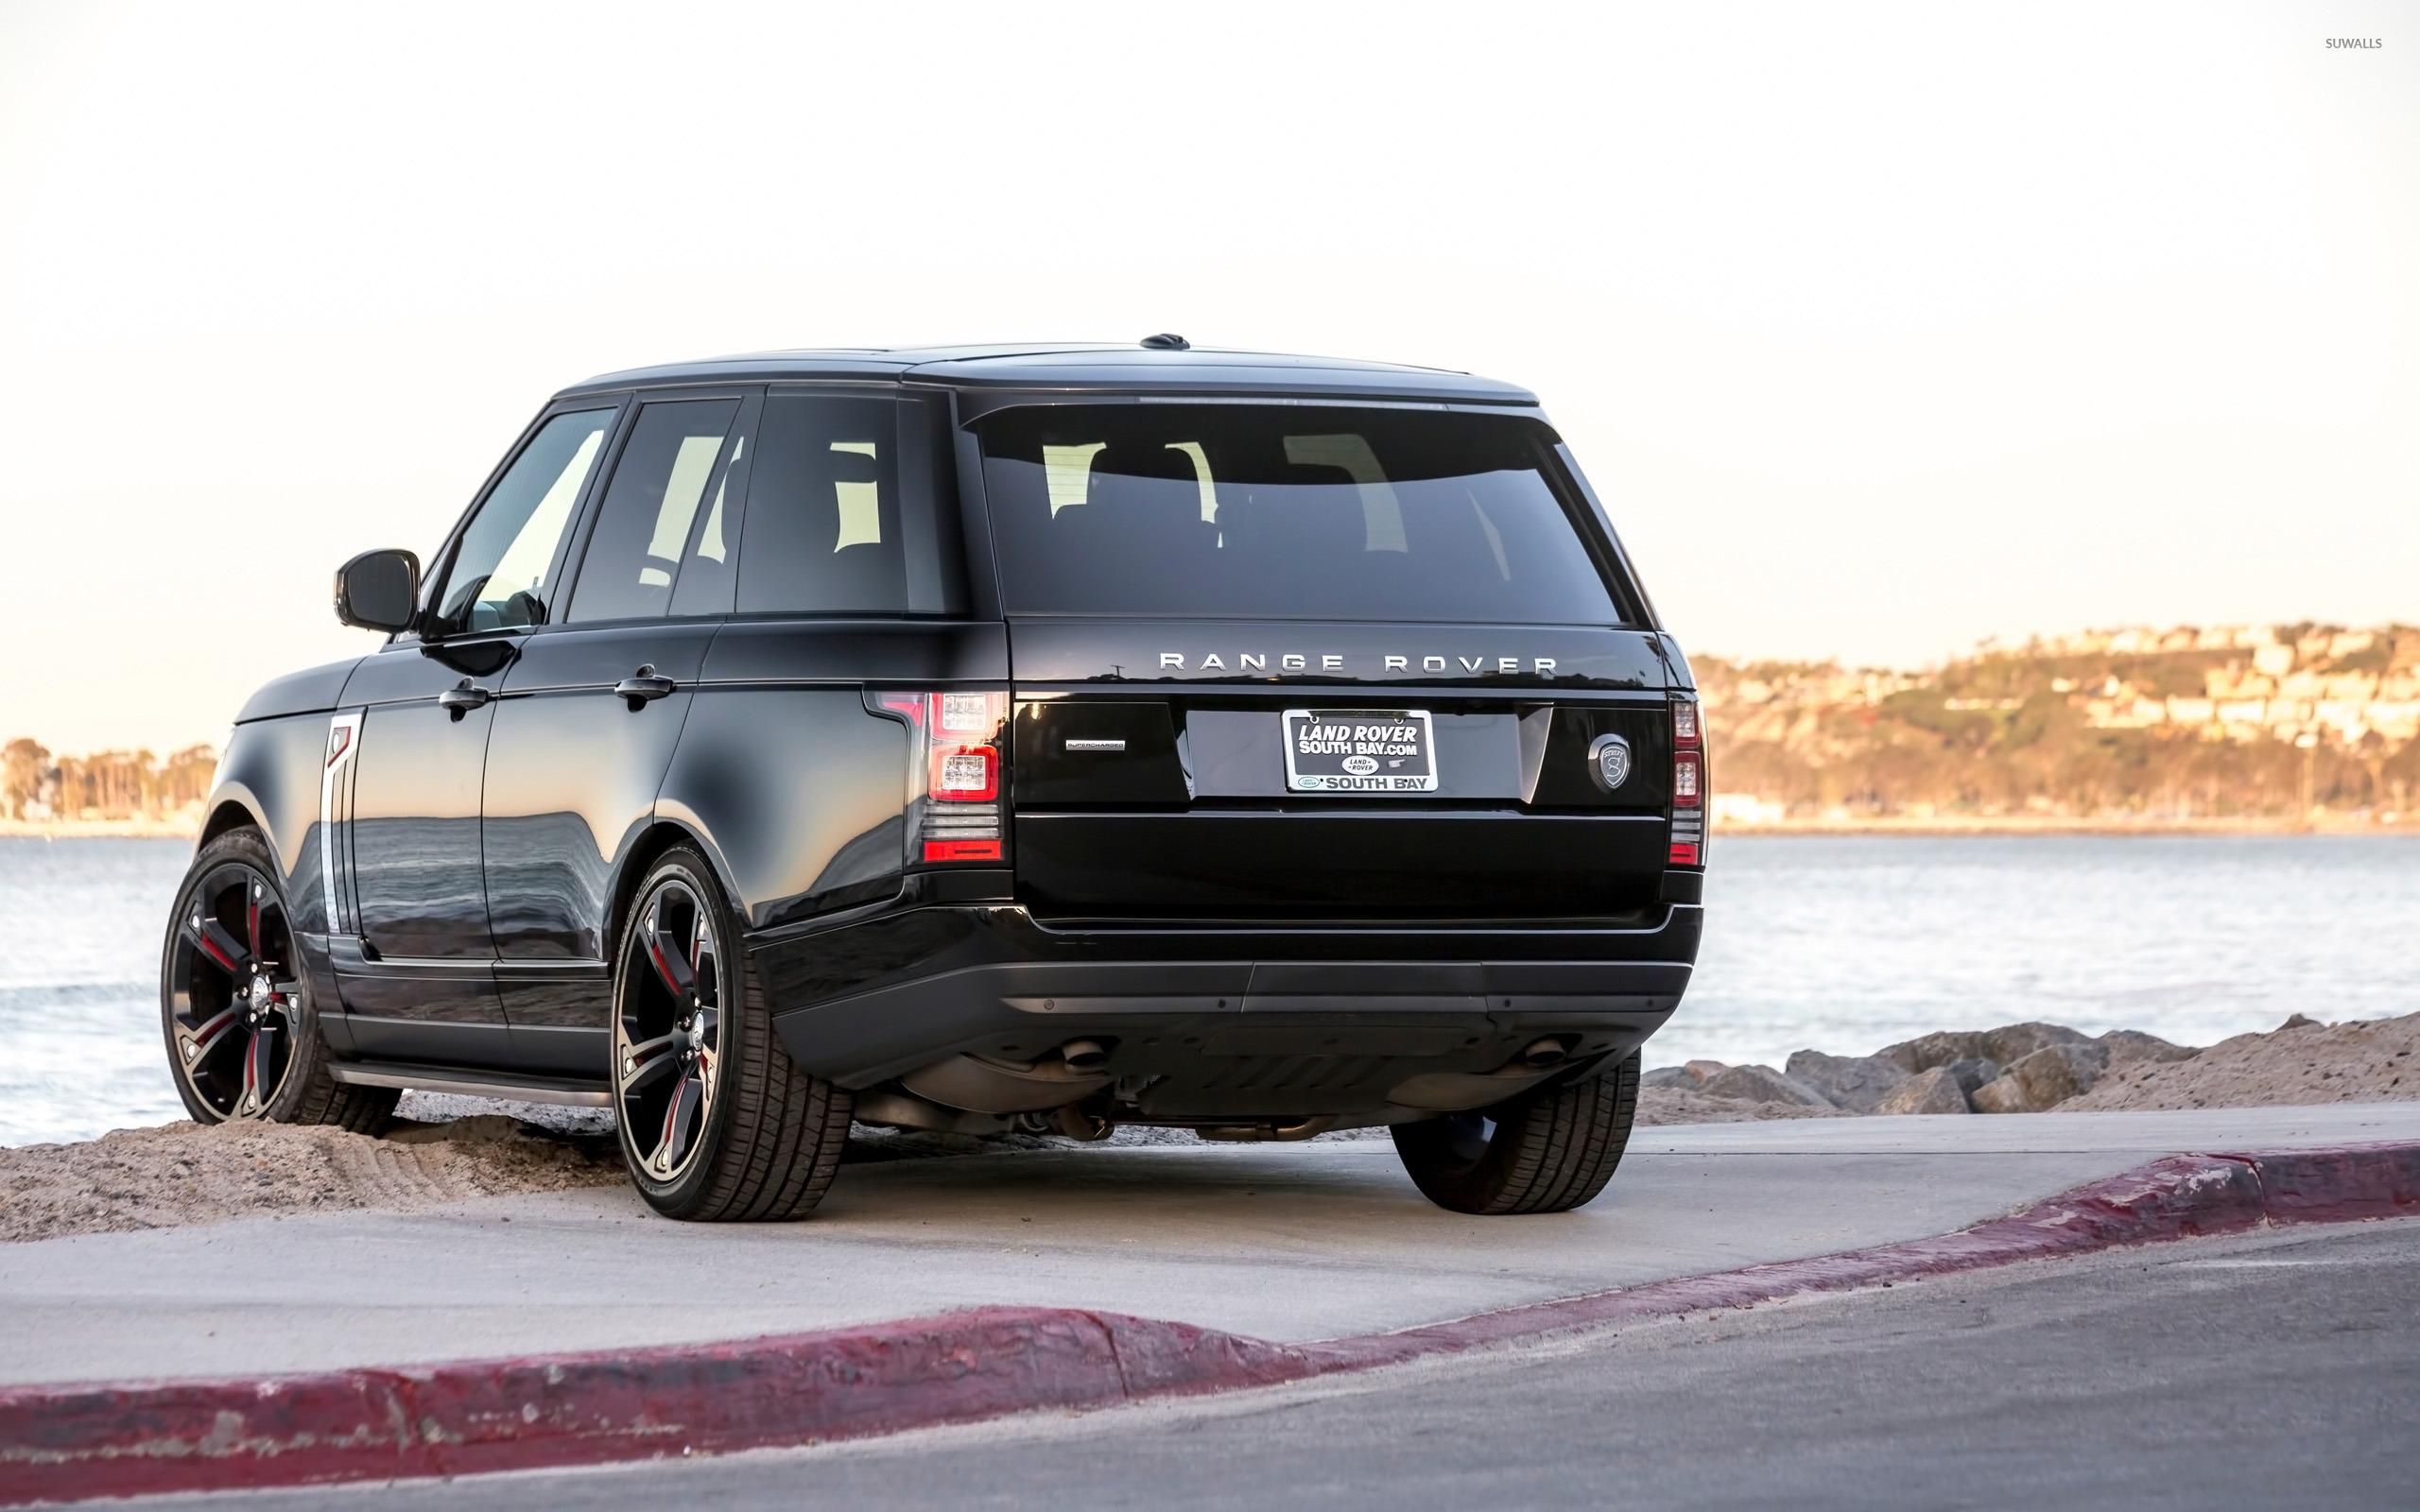 Strut Land Rover Range Rover Parked Back Side View